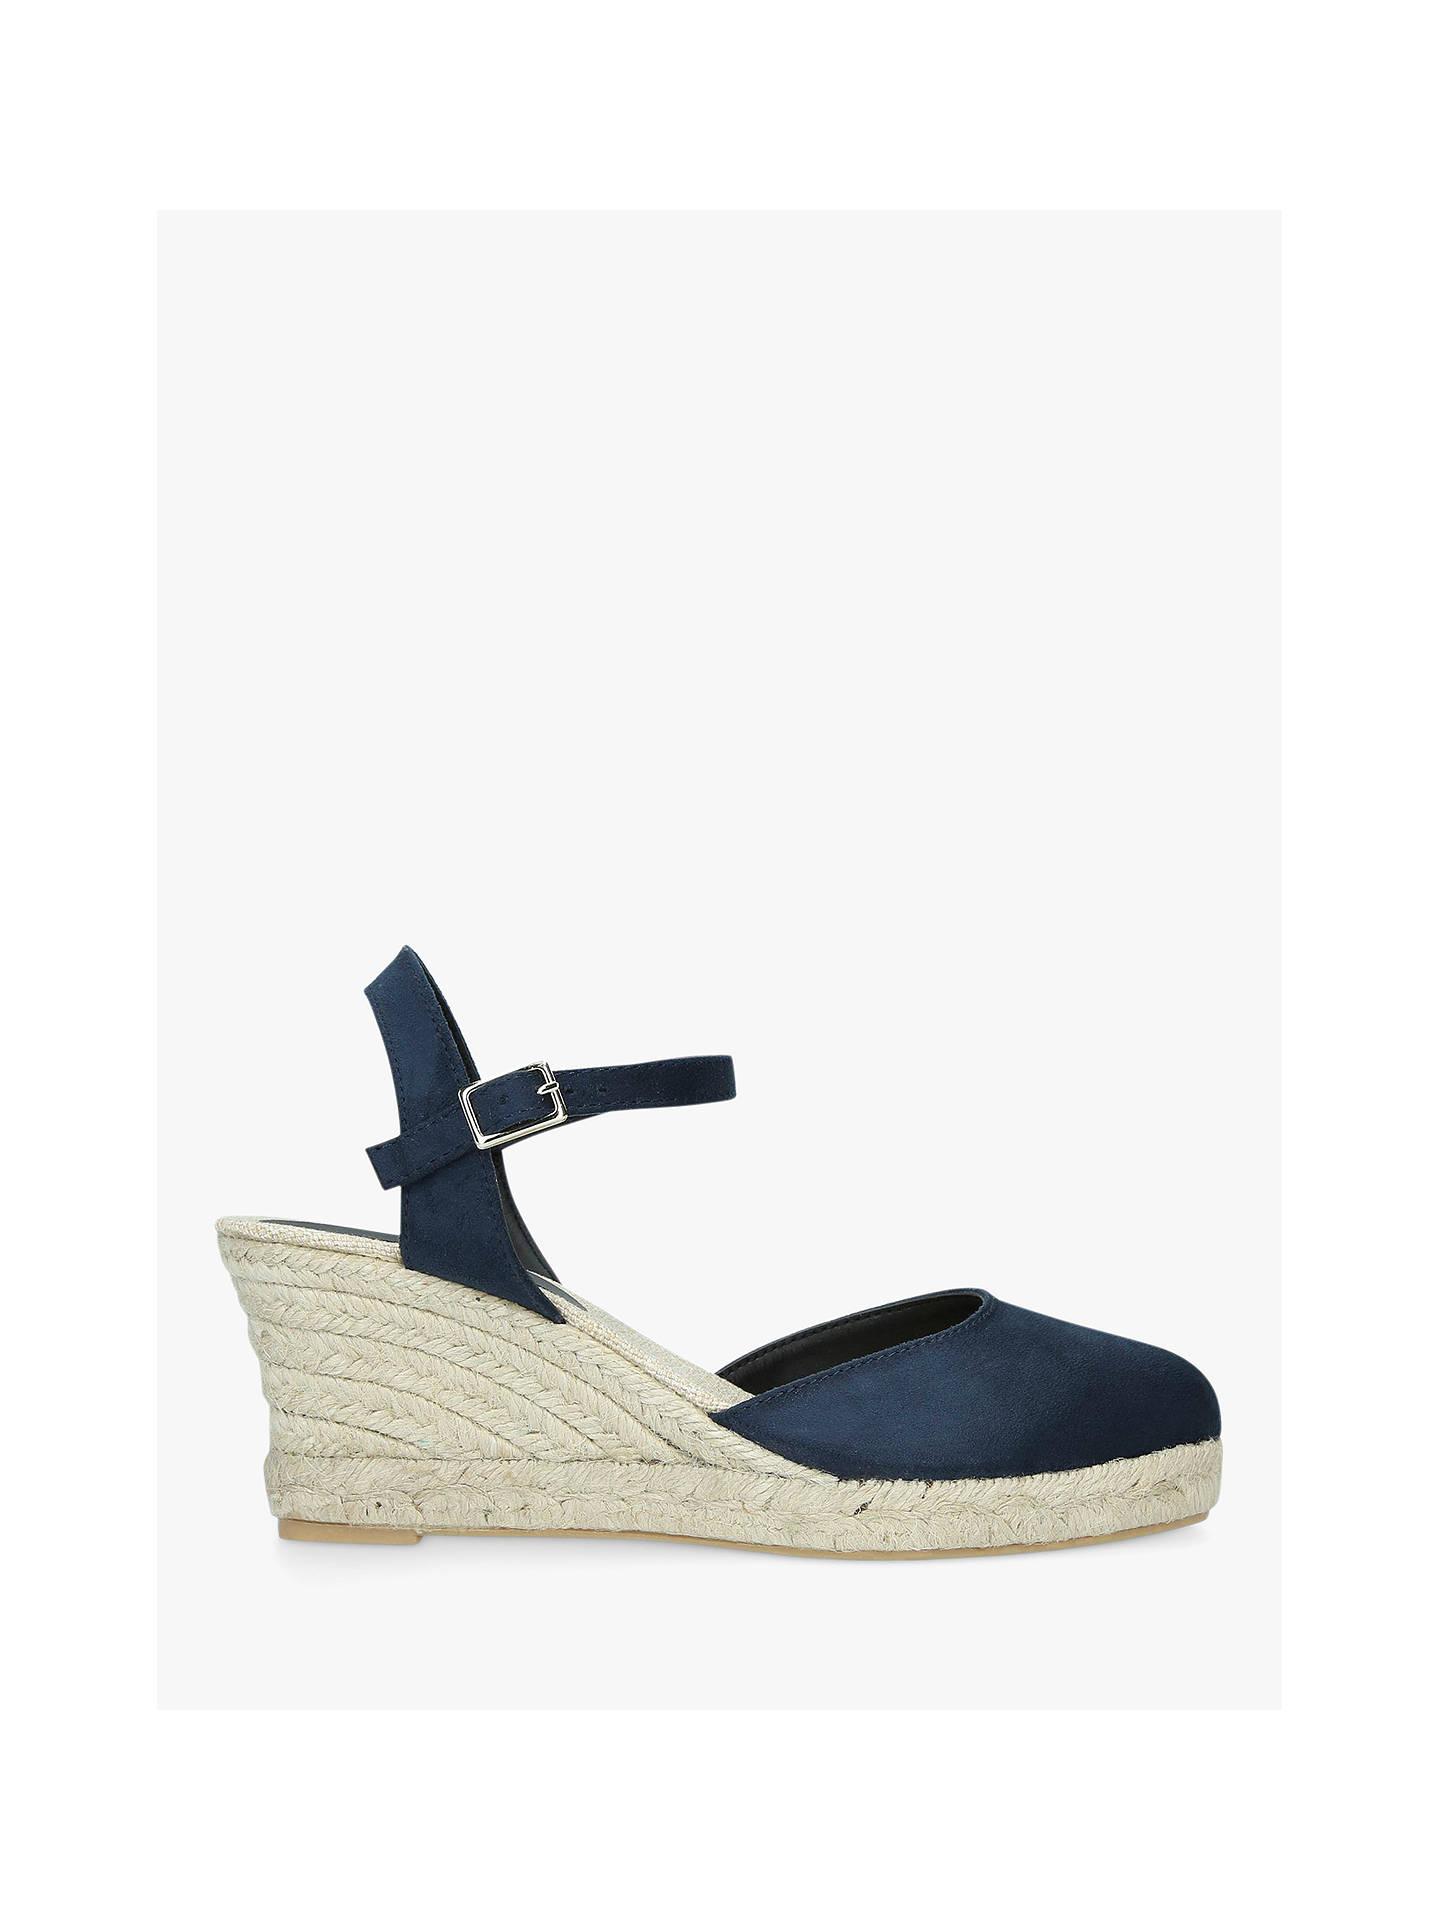 732adff40a2 Buy Carvela Sabrina 2 Wedge Heel Sandals